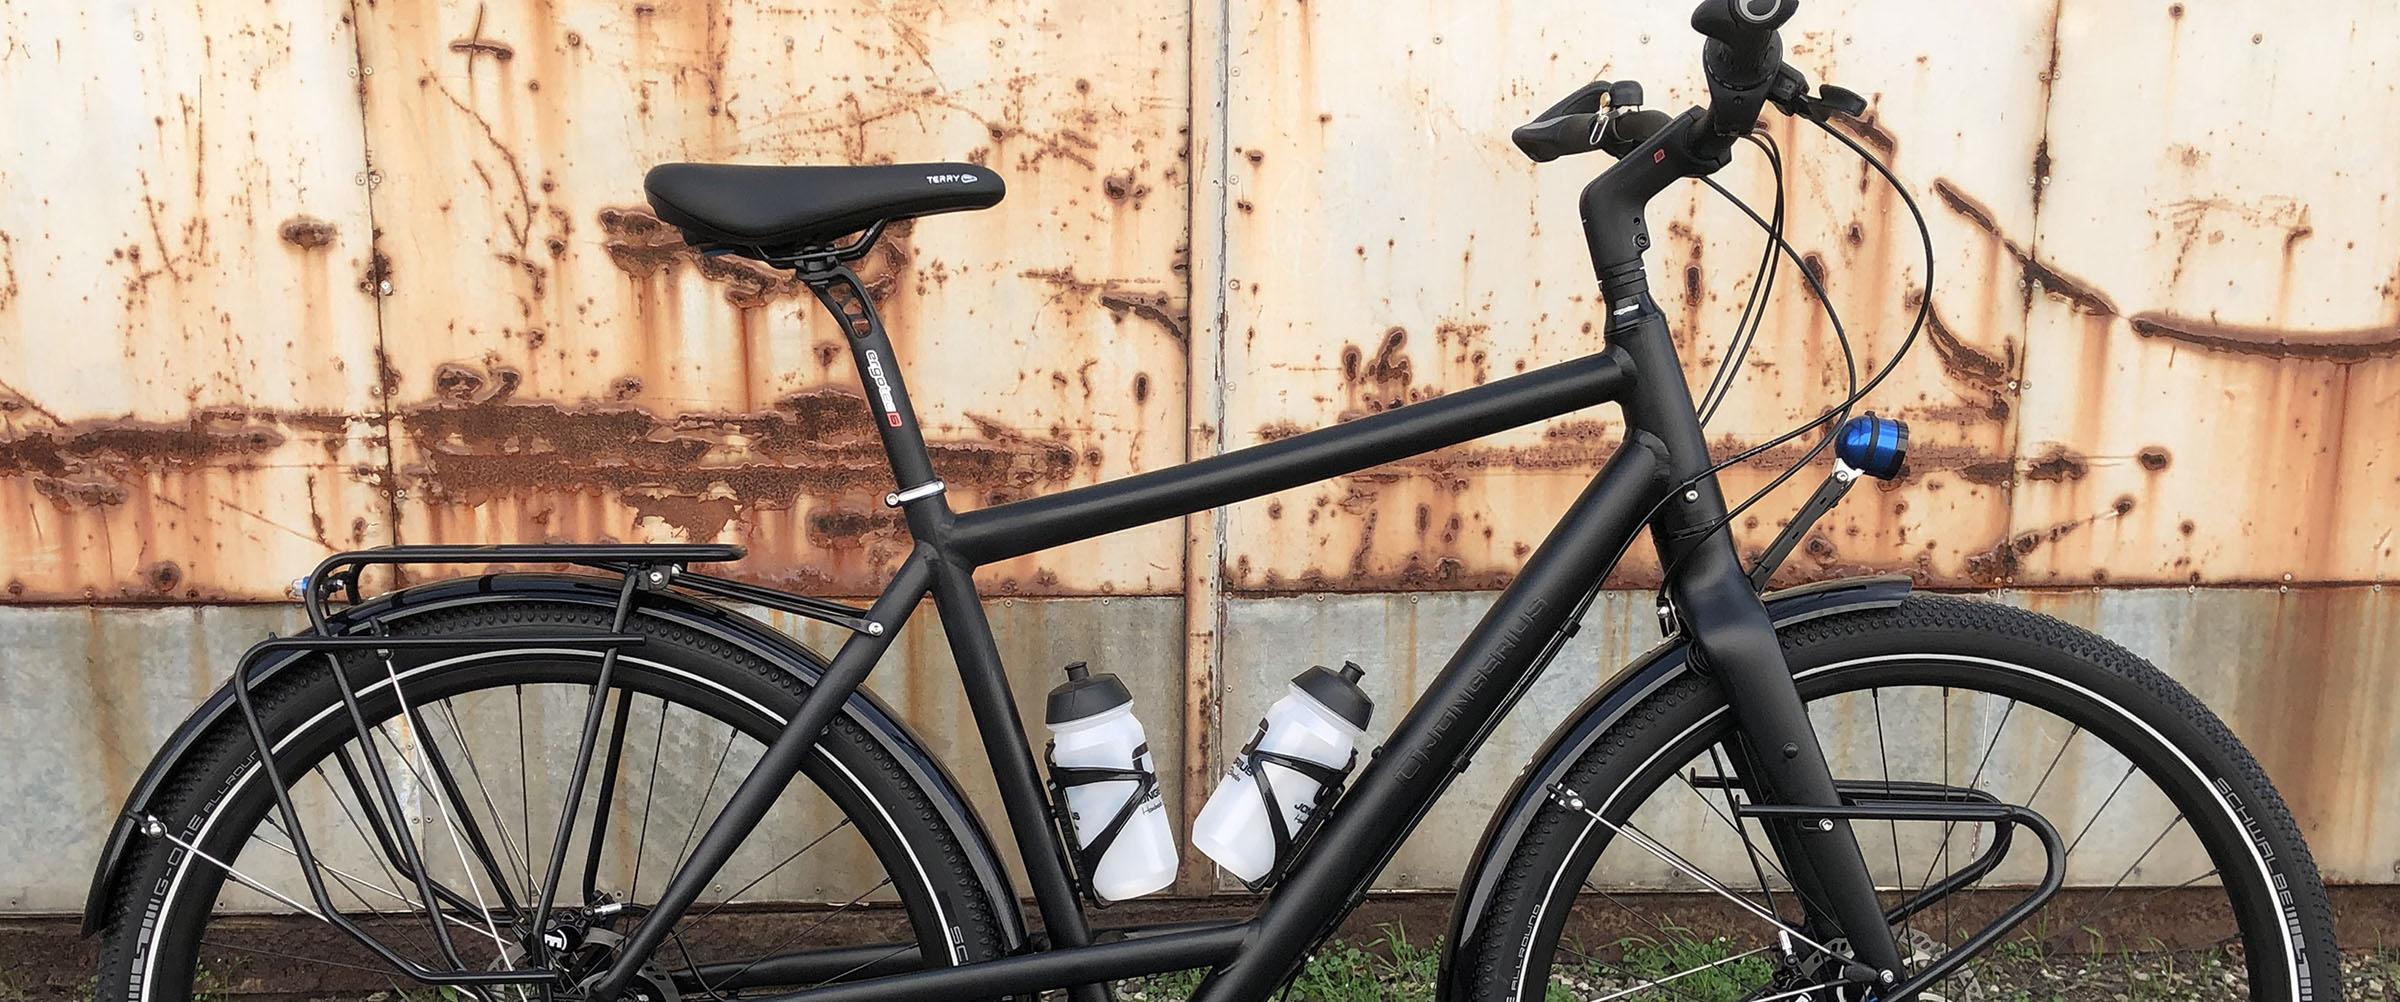 Jongerius Handmade Bicycles